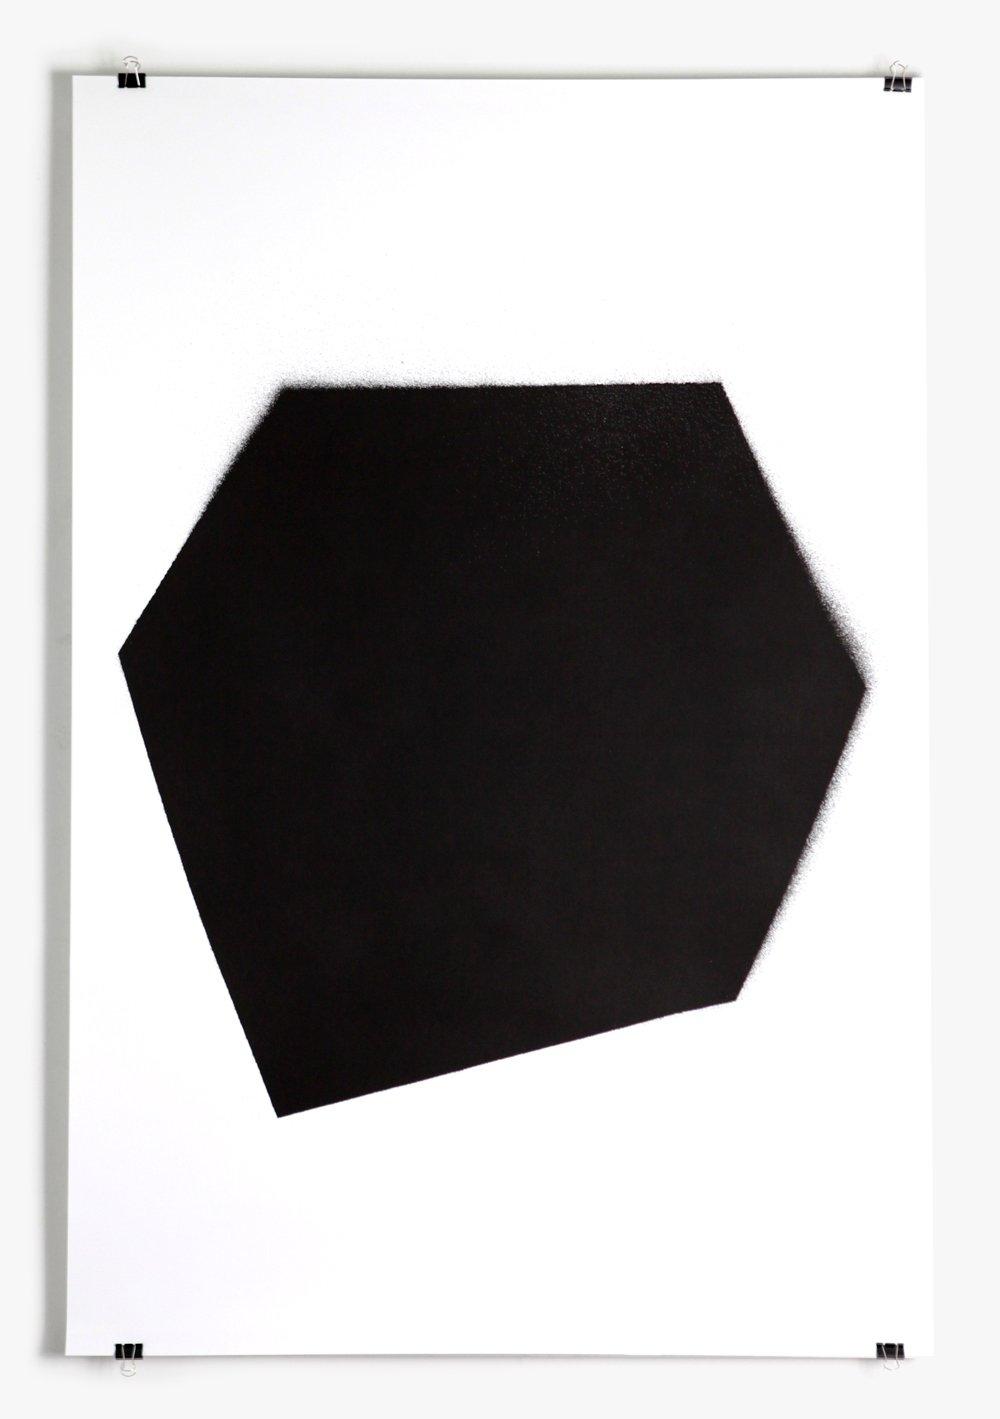 Image of Black stencil - poster #5